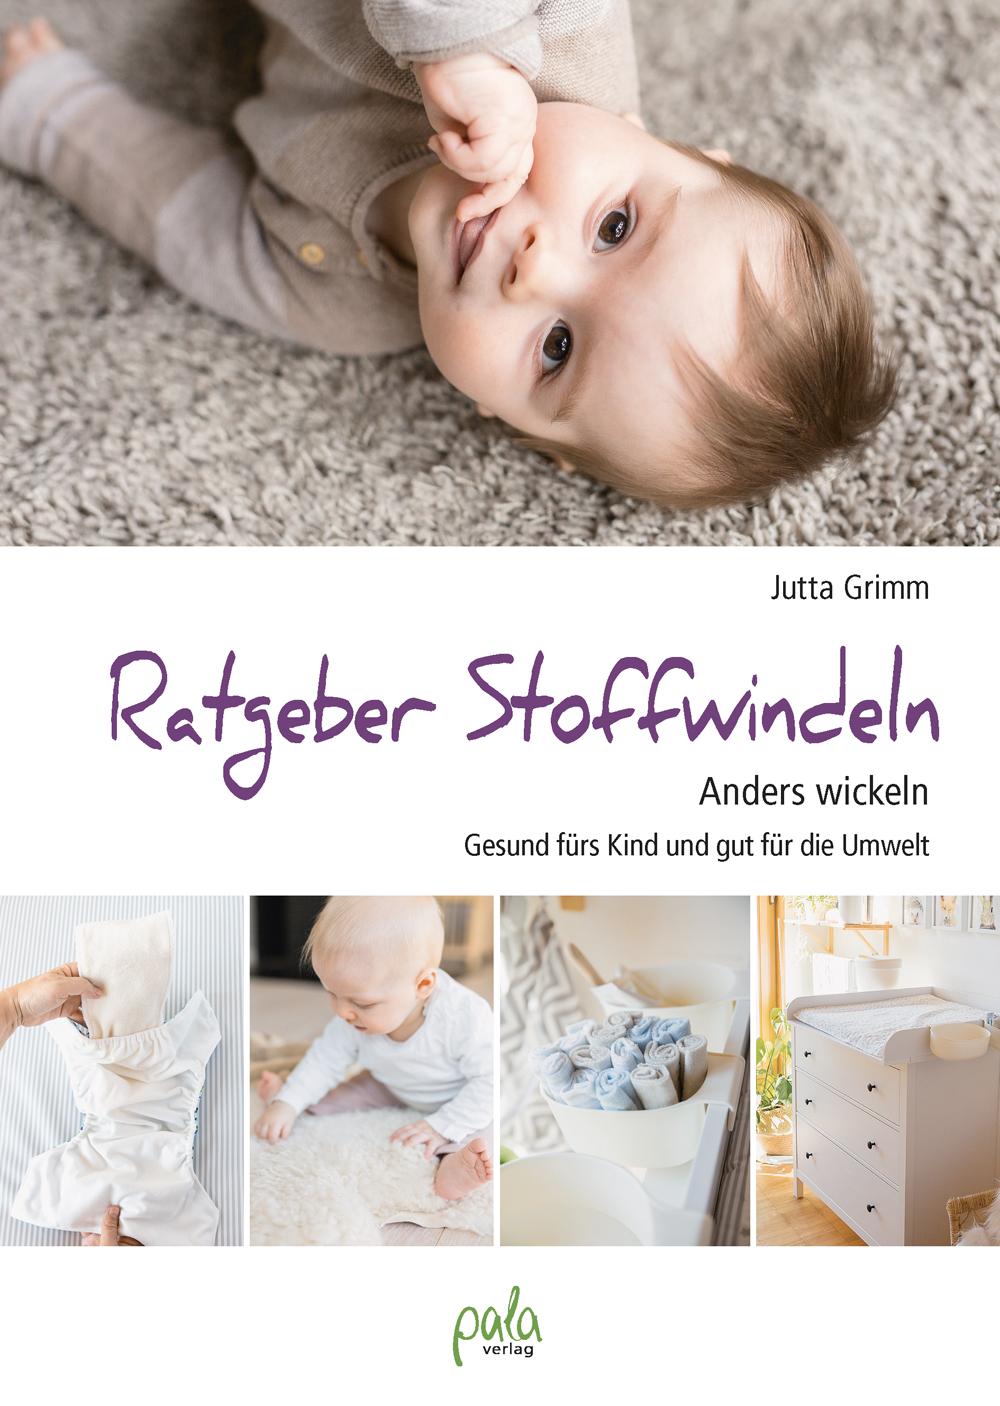 Ratgeber Stoffwindeln - pala Verlag